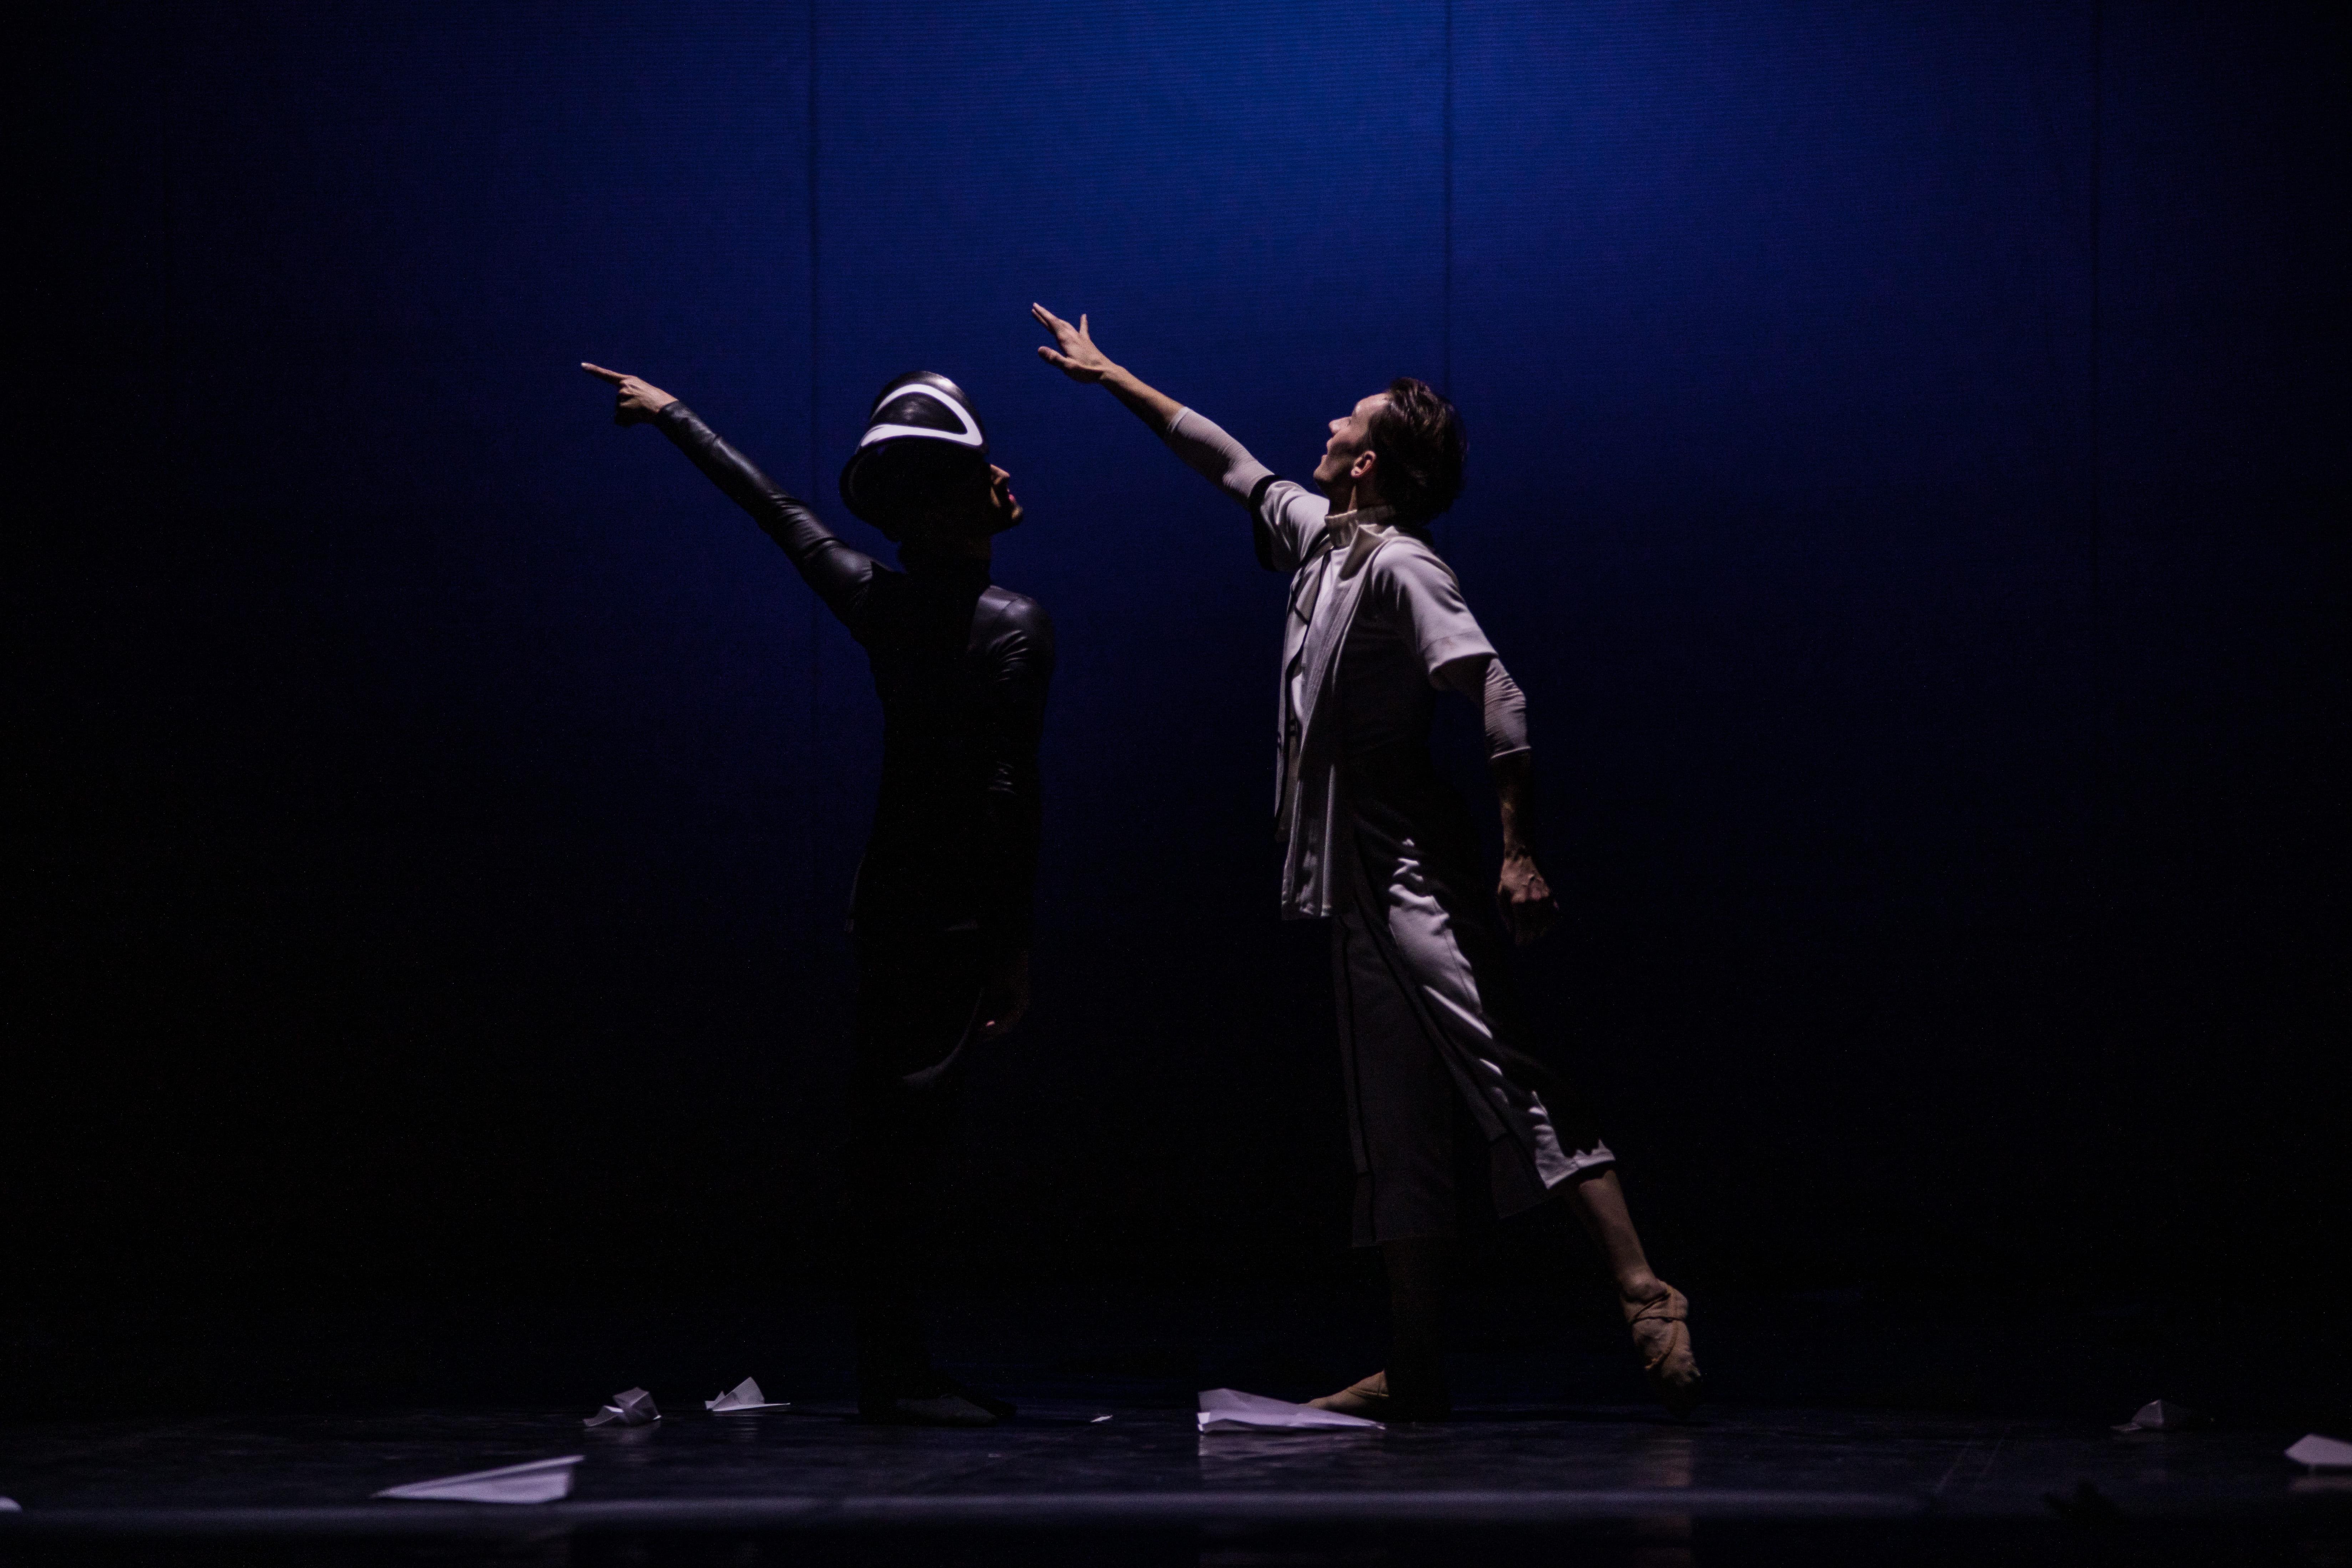 ТЕАТР Kyiv Modern Ballet. Маленький принц. Pаду Поклитару-1